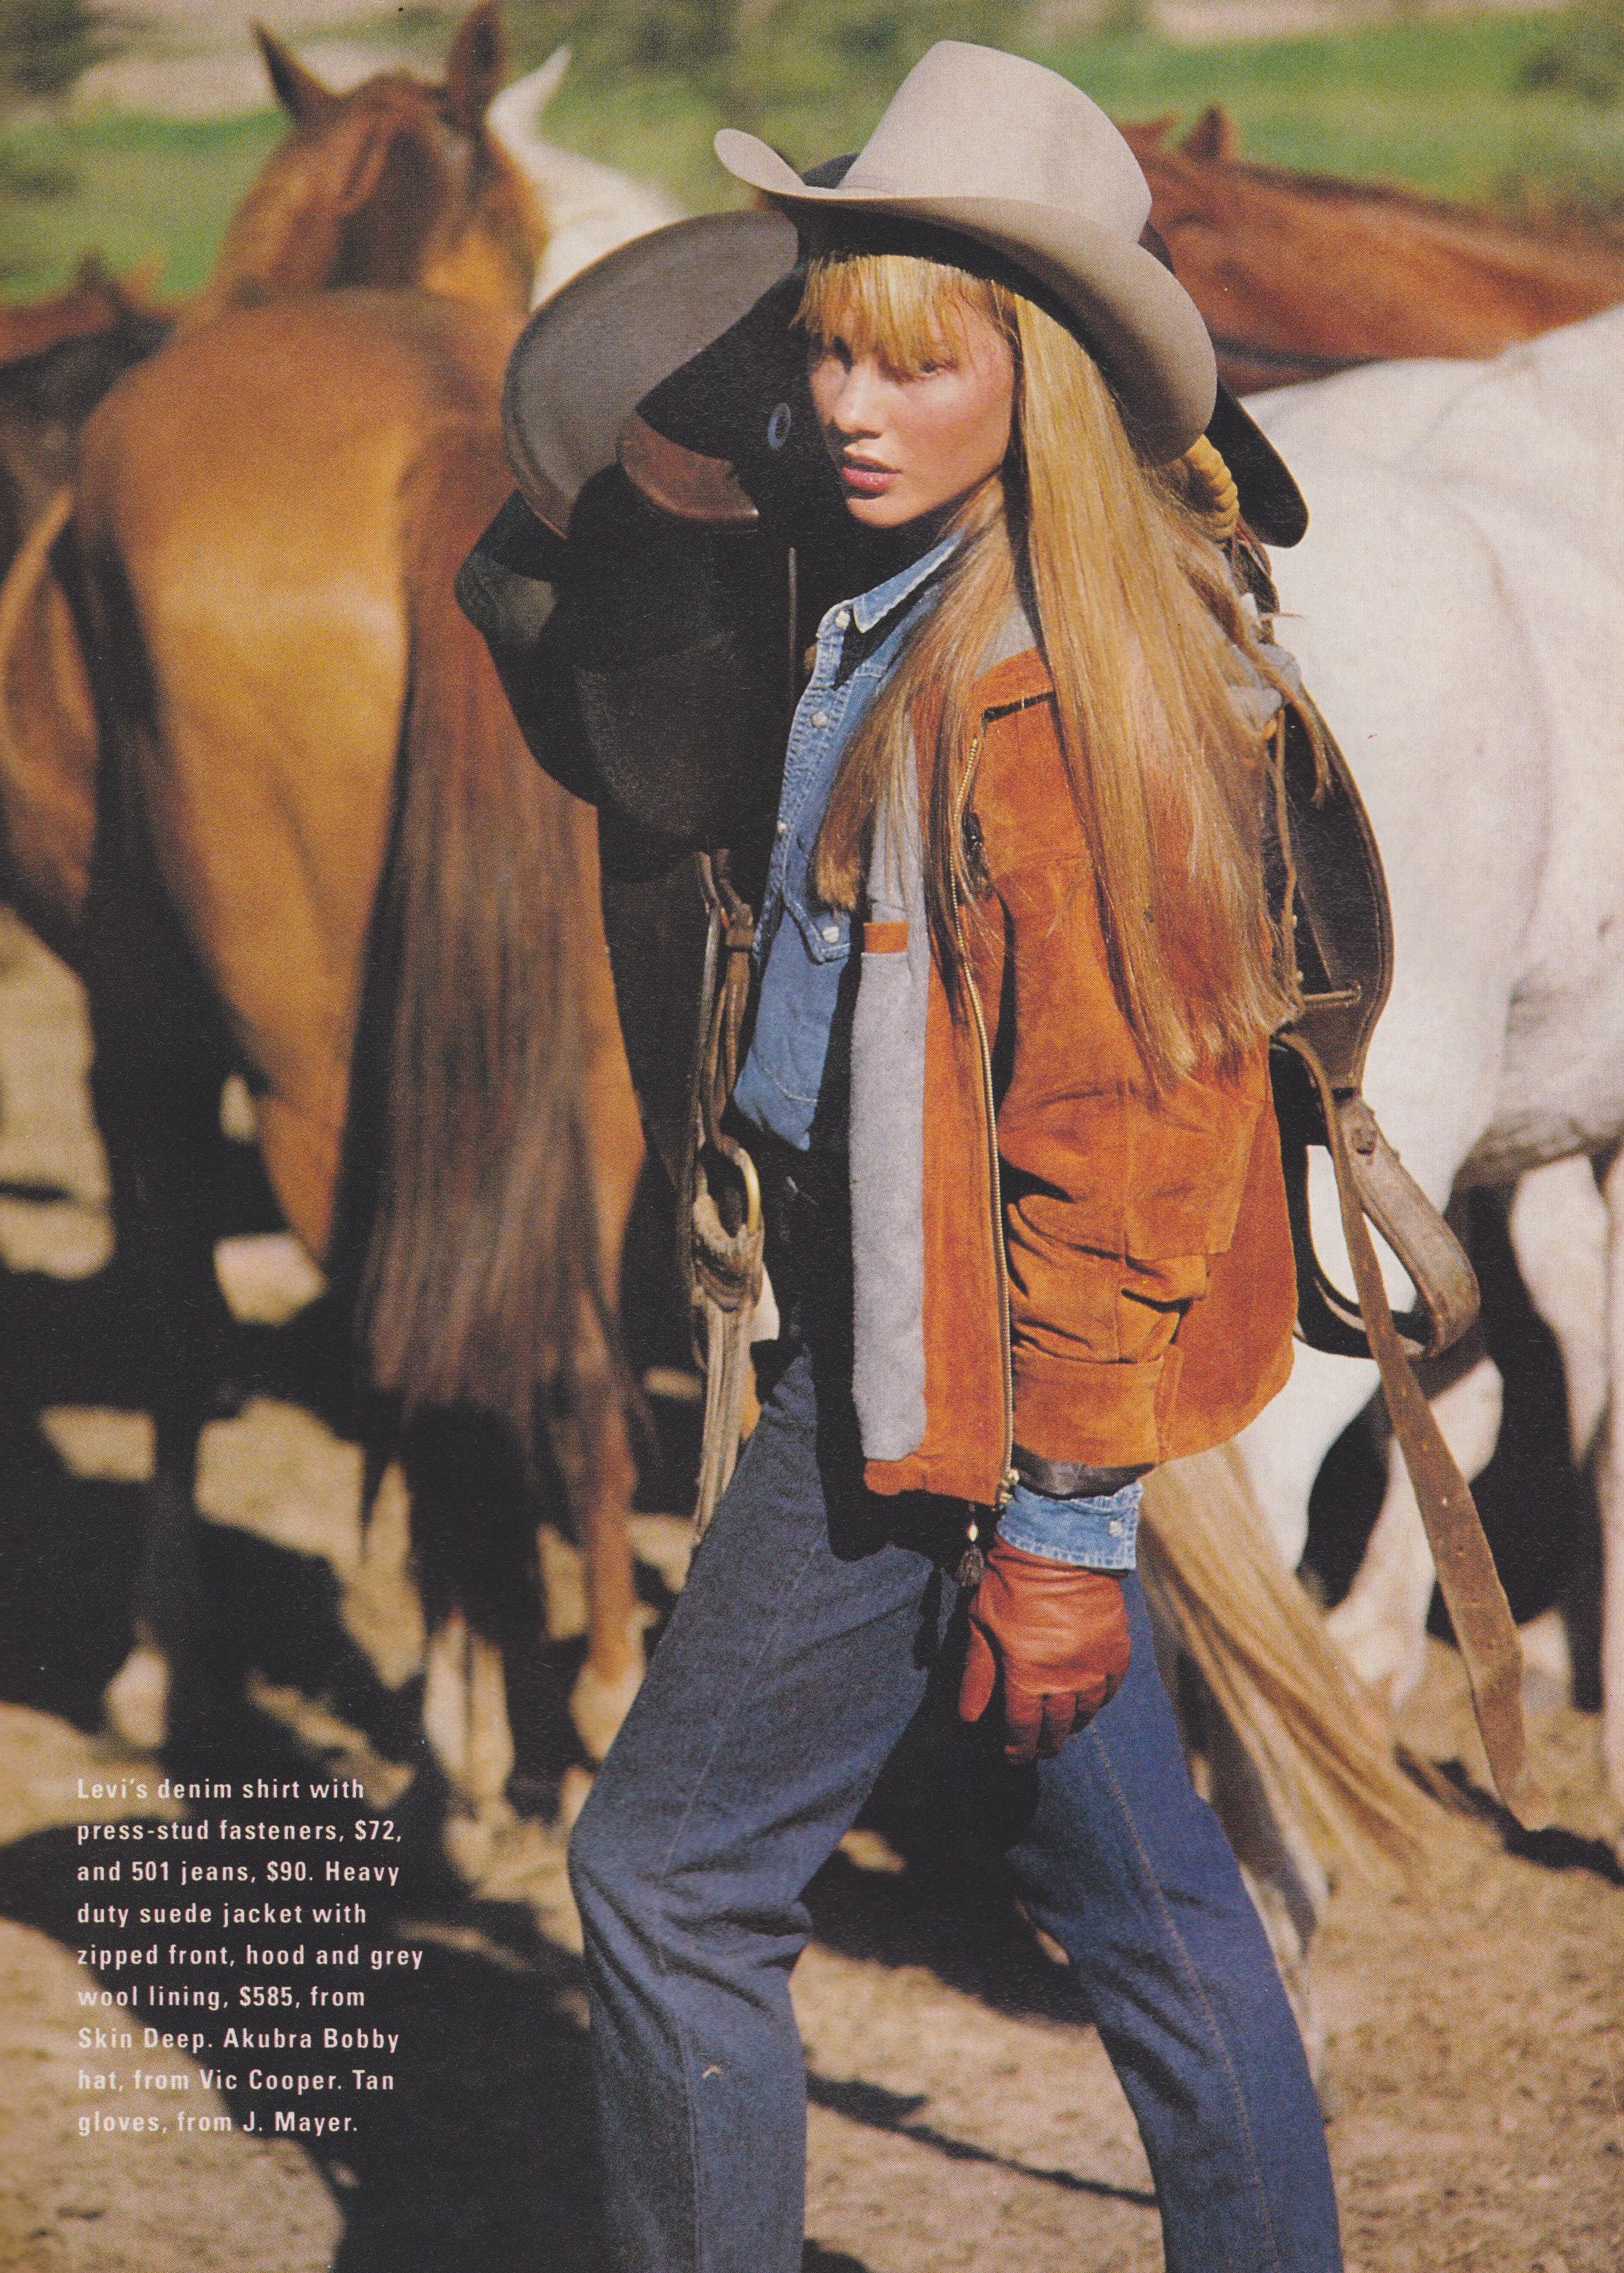 Cosmo June 1990 | International Style 16.jpeg